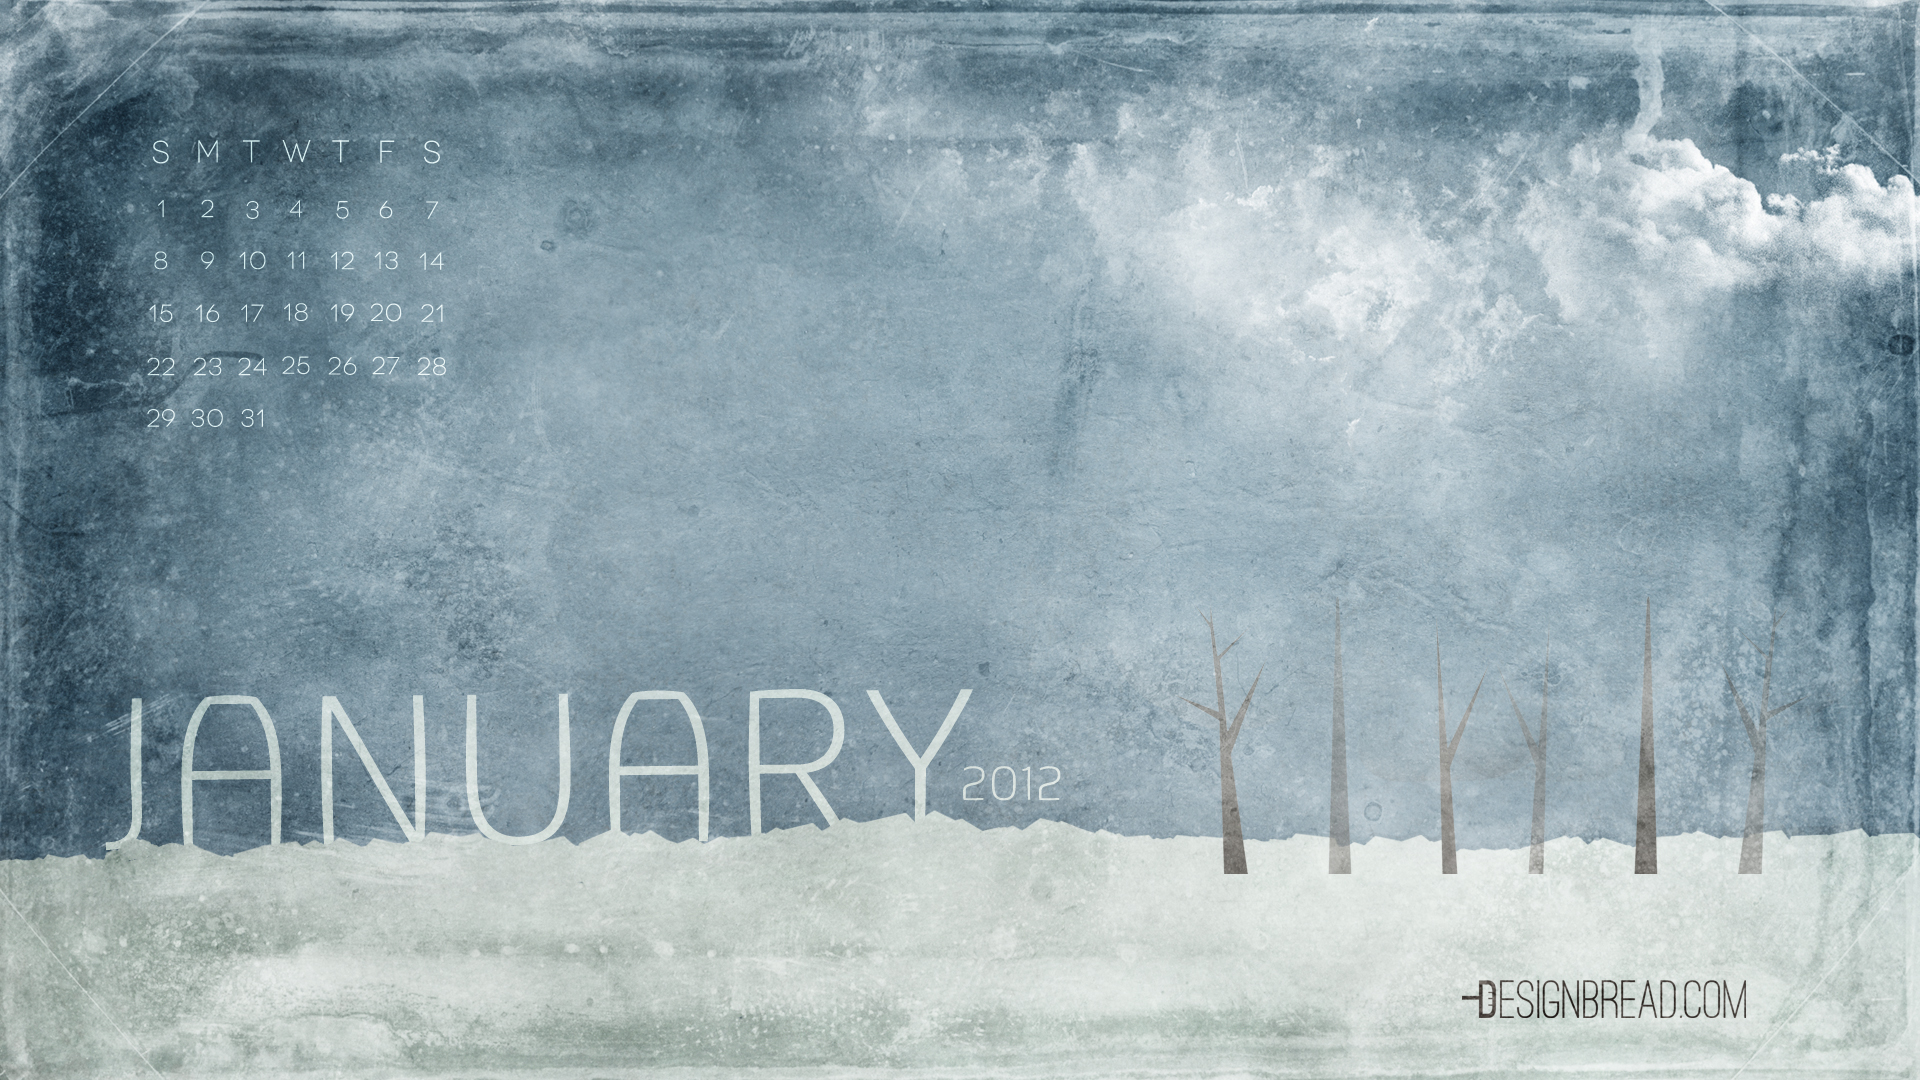 January Calendar Wallpaper Hd : Photo collection smashing magazine wallpaper january